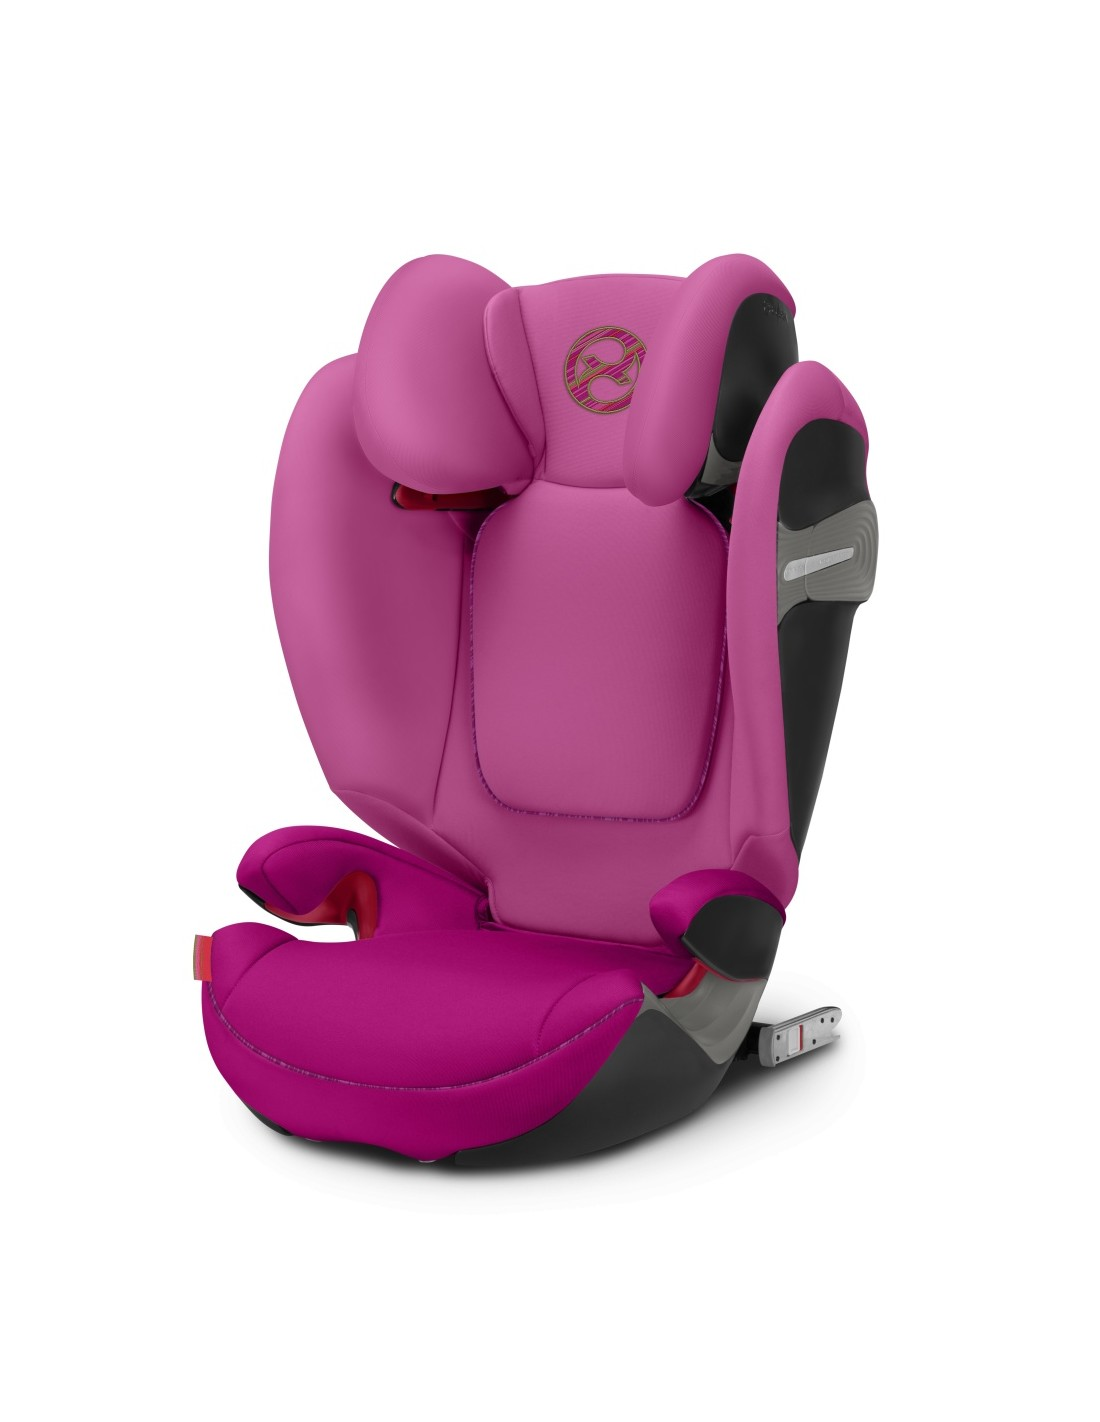 cybex solution s fix fancy pink. Black Bedroom Furniture Sets. Home Design Ideas